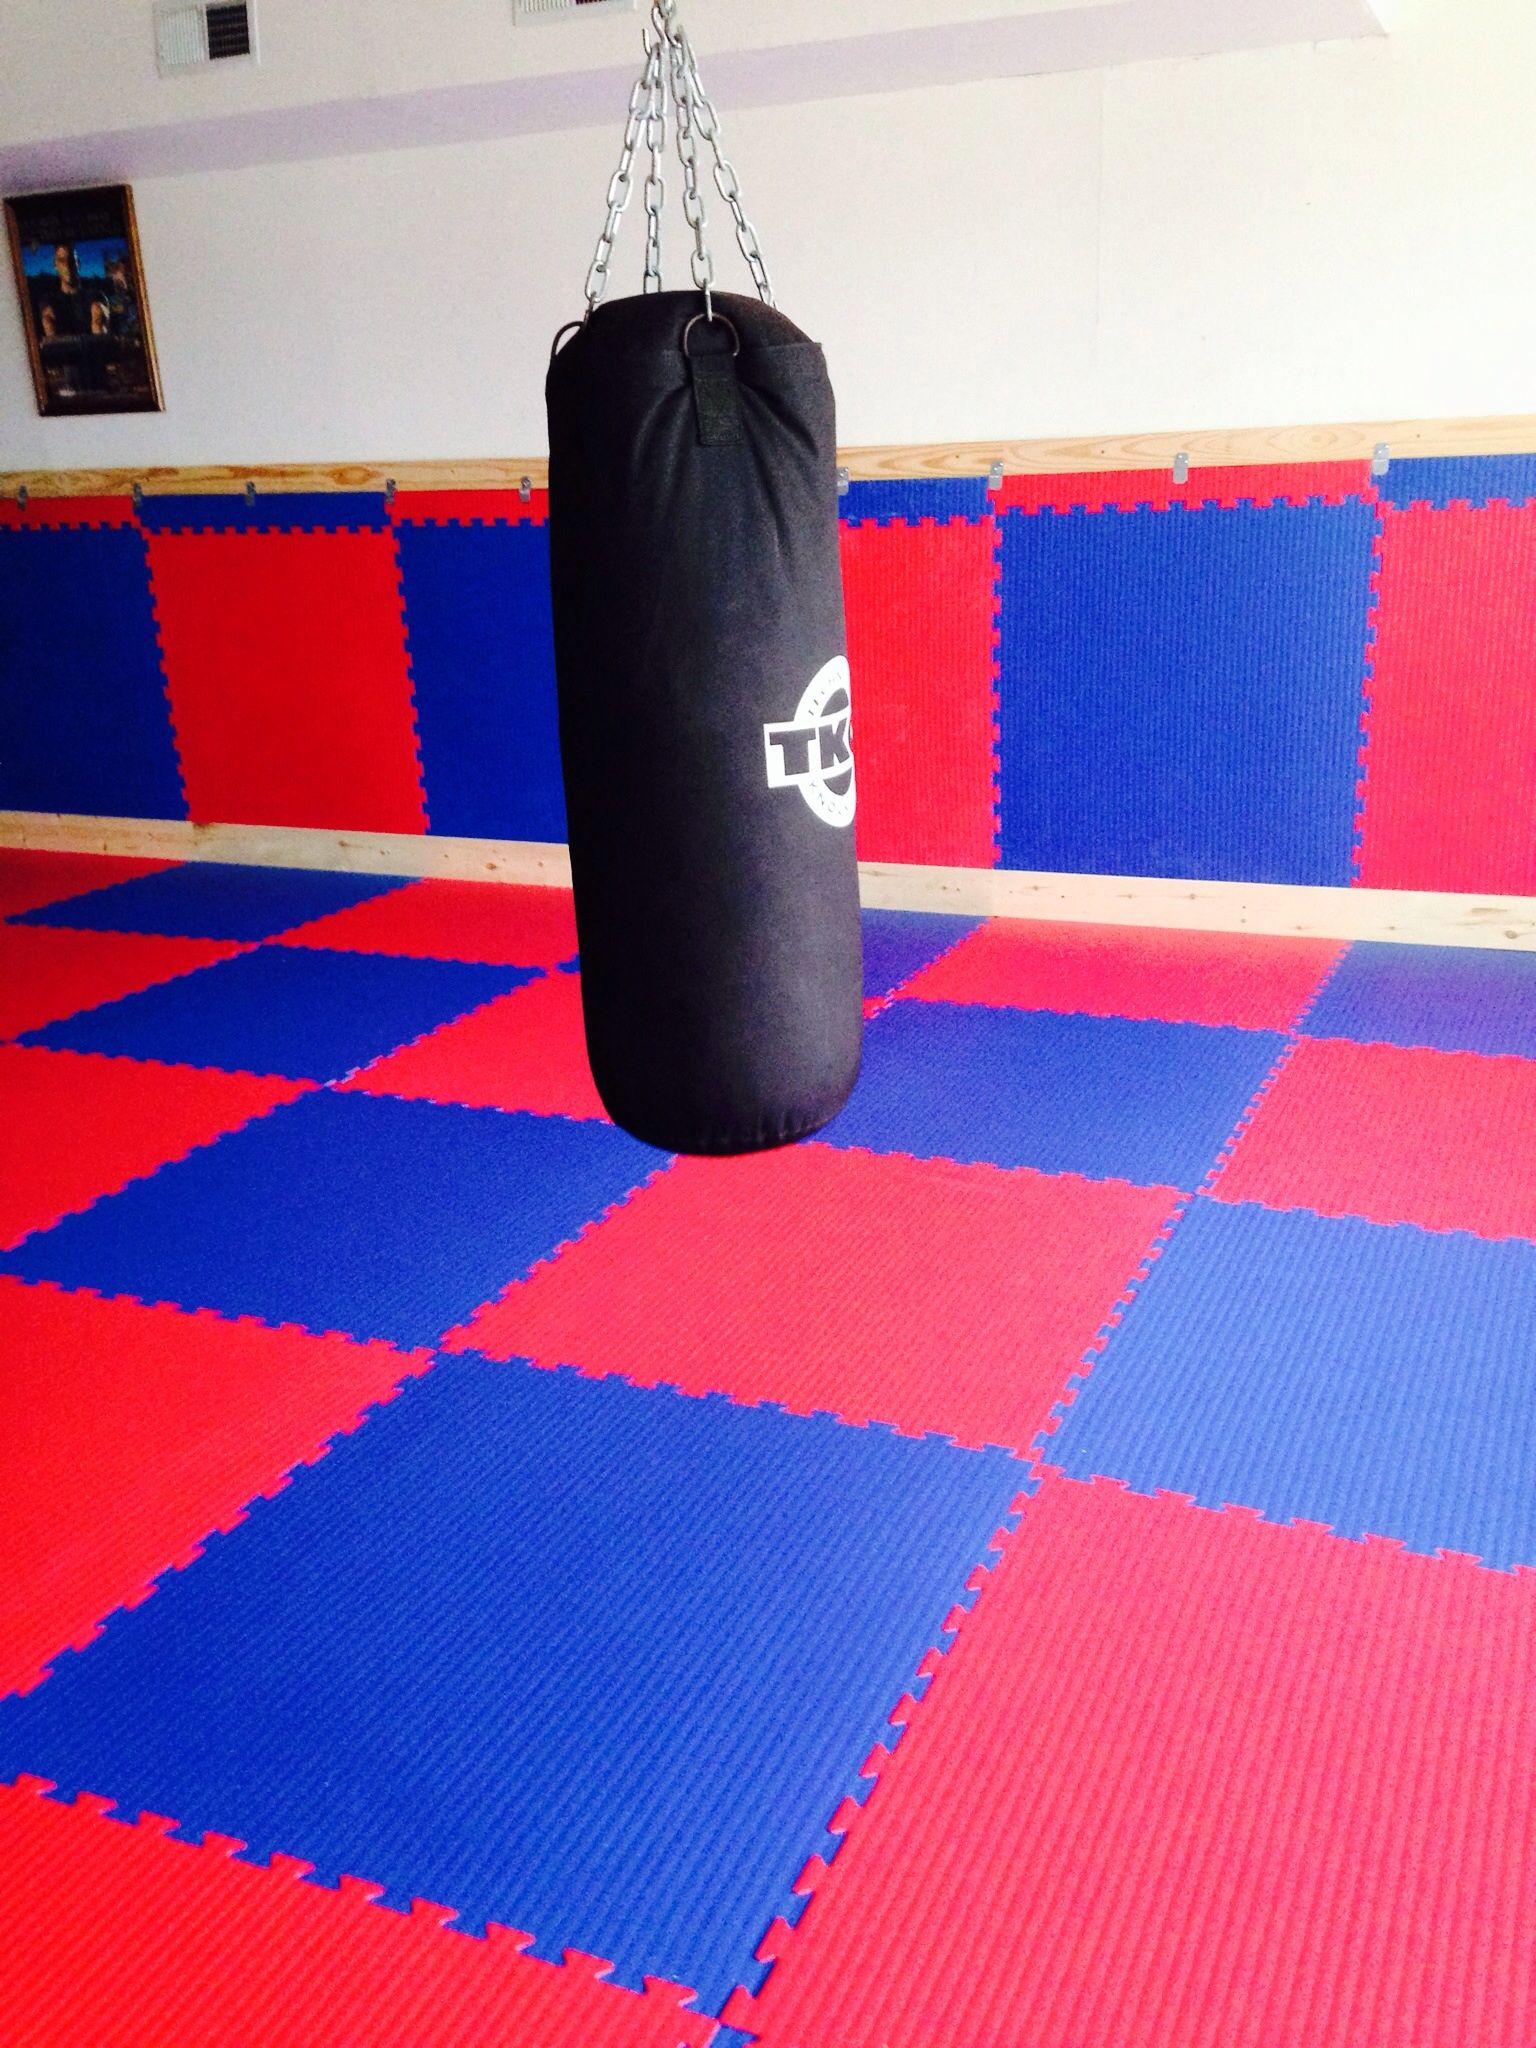 Grappling And Mma Mats For Bjj Jiu Jitsu Dojo And Studios Mma Mat Martial Arts Mats Grappling Mats